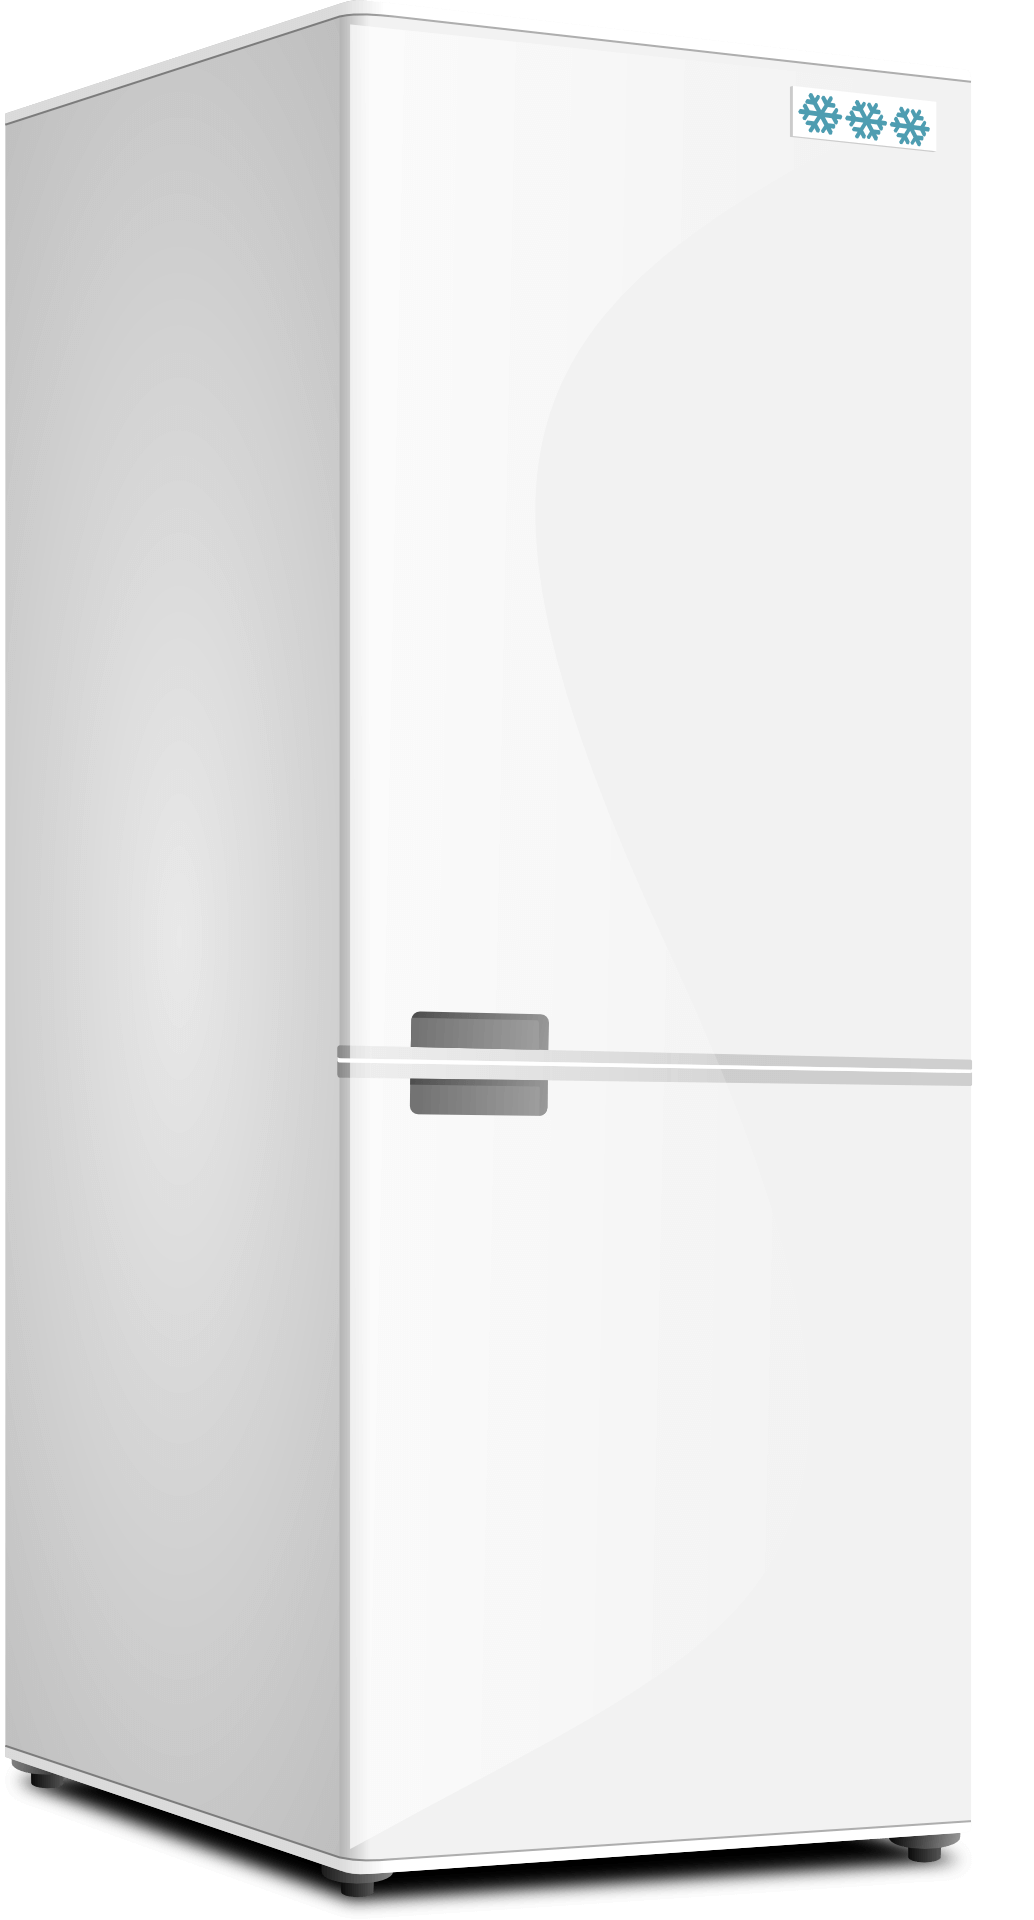 Холодильник картинки на белом фоне